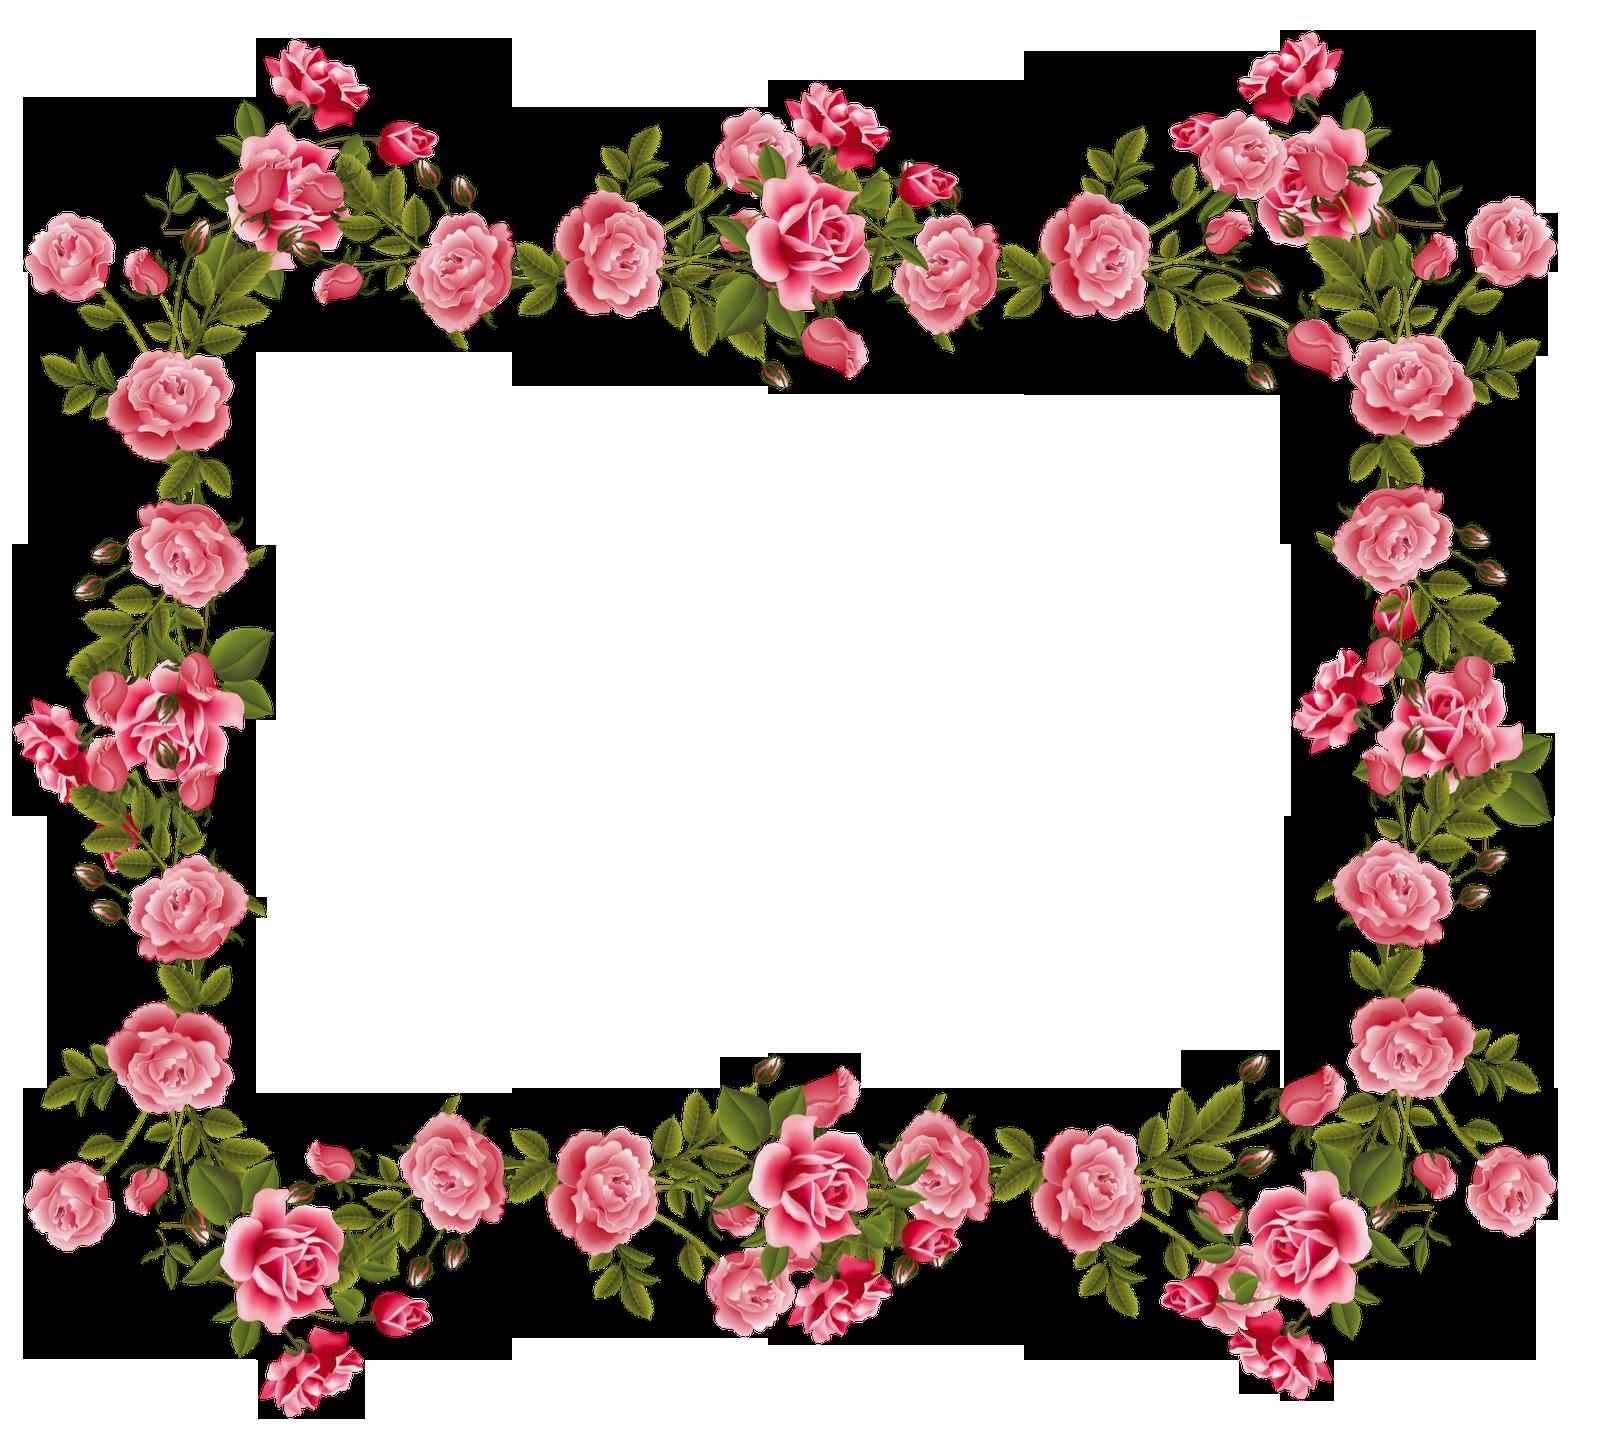 Rose Borders And Frames Roses Scrapbooking Frames And Journaling Spot And Butterfly Border Flower Border Rose Frame Vintage Roses